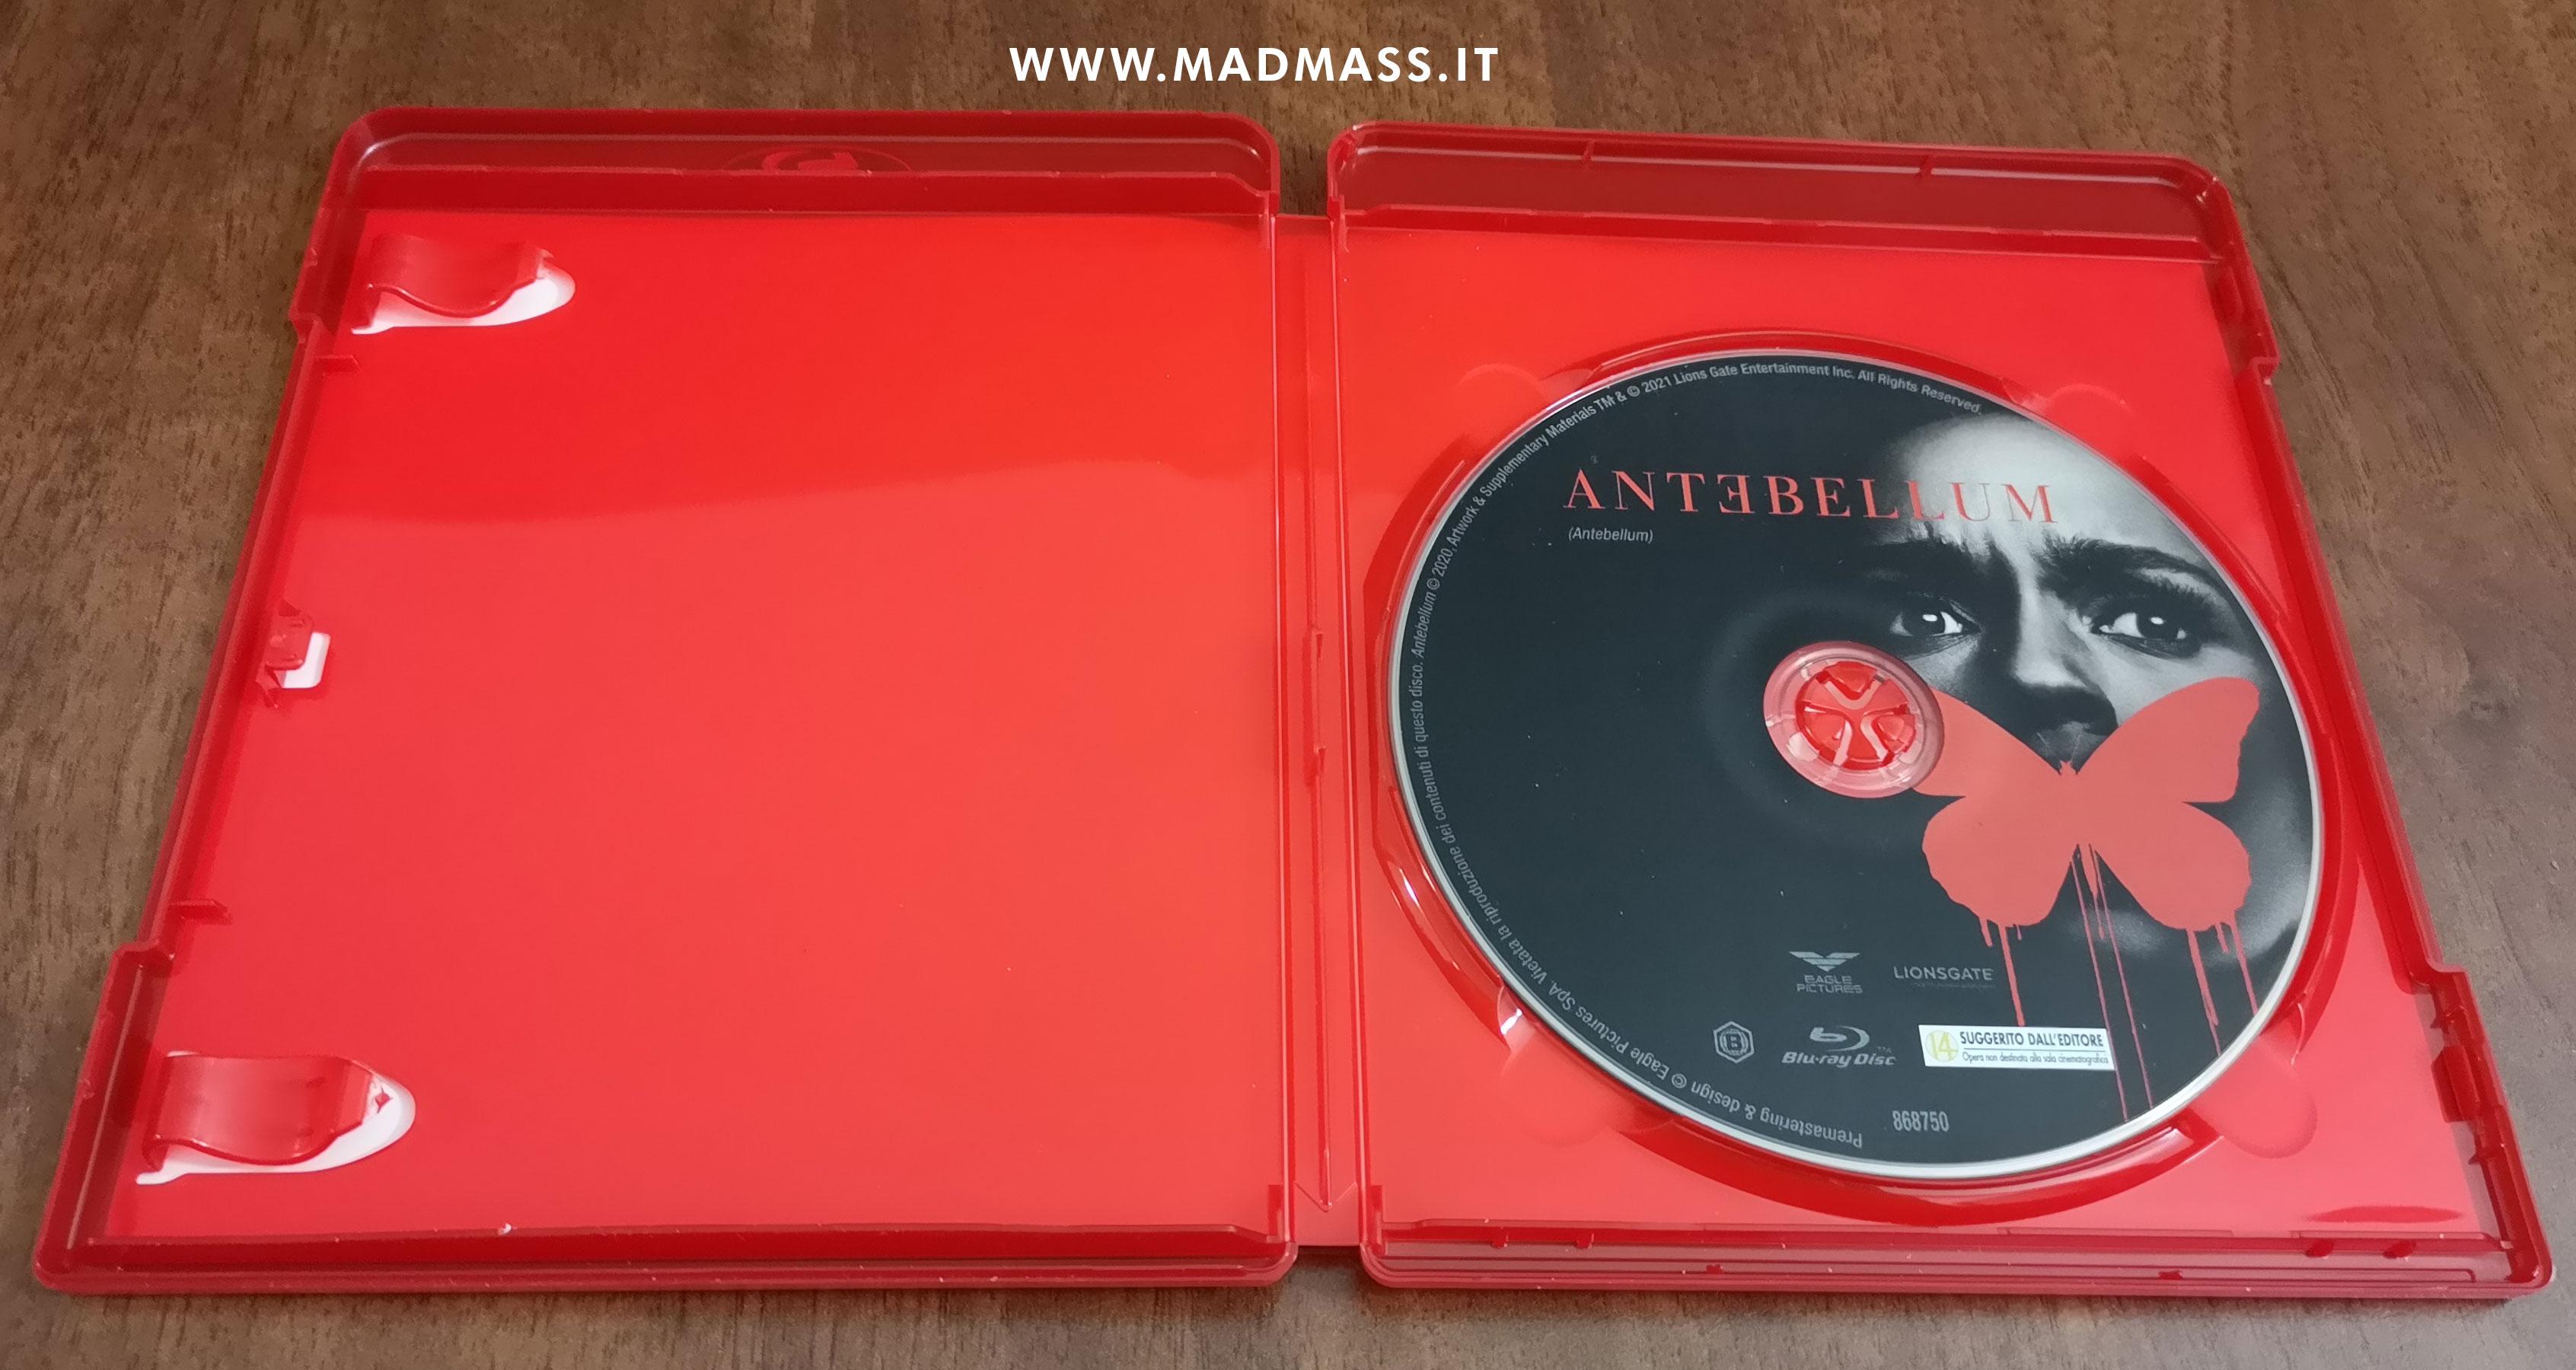 L'edizione home video in Blu-ray di Antebellum